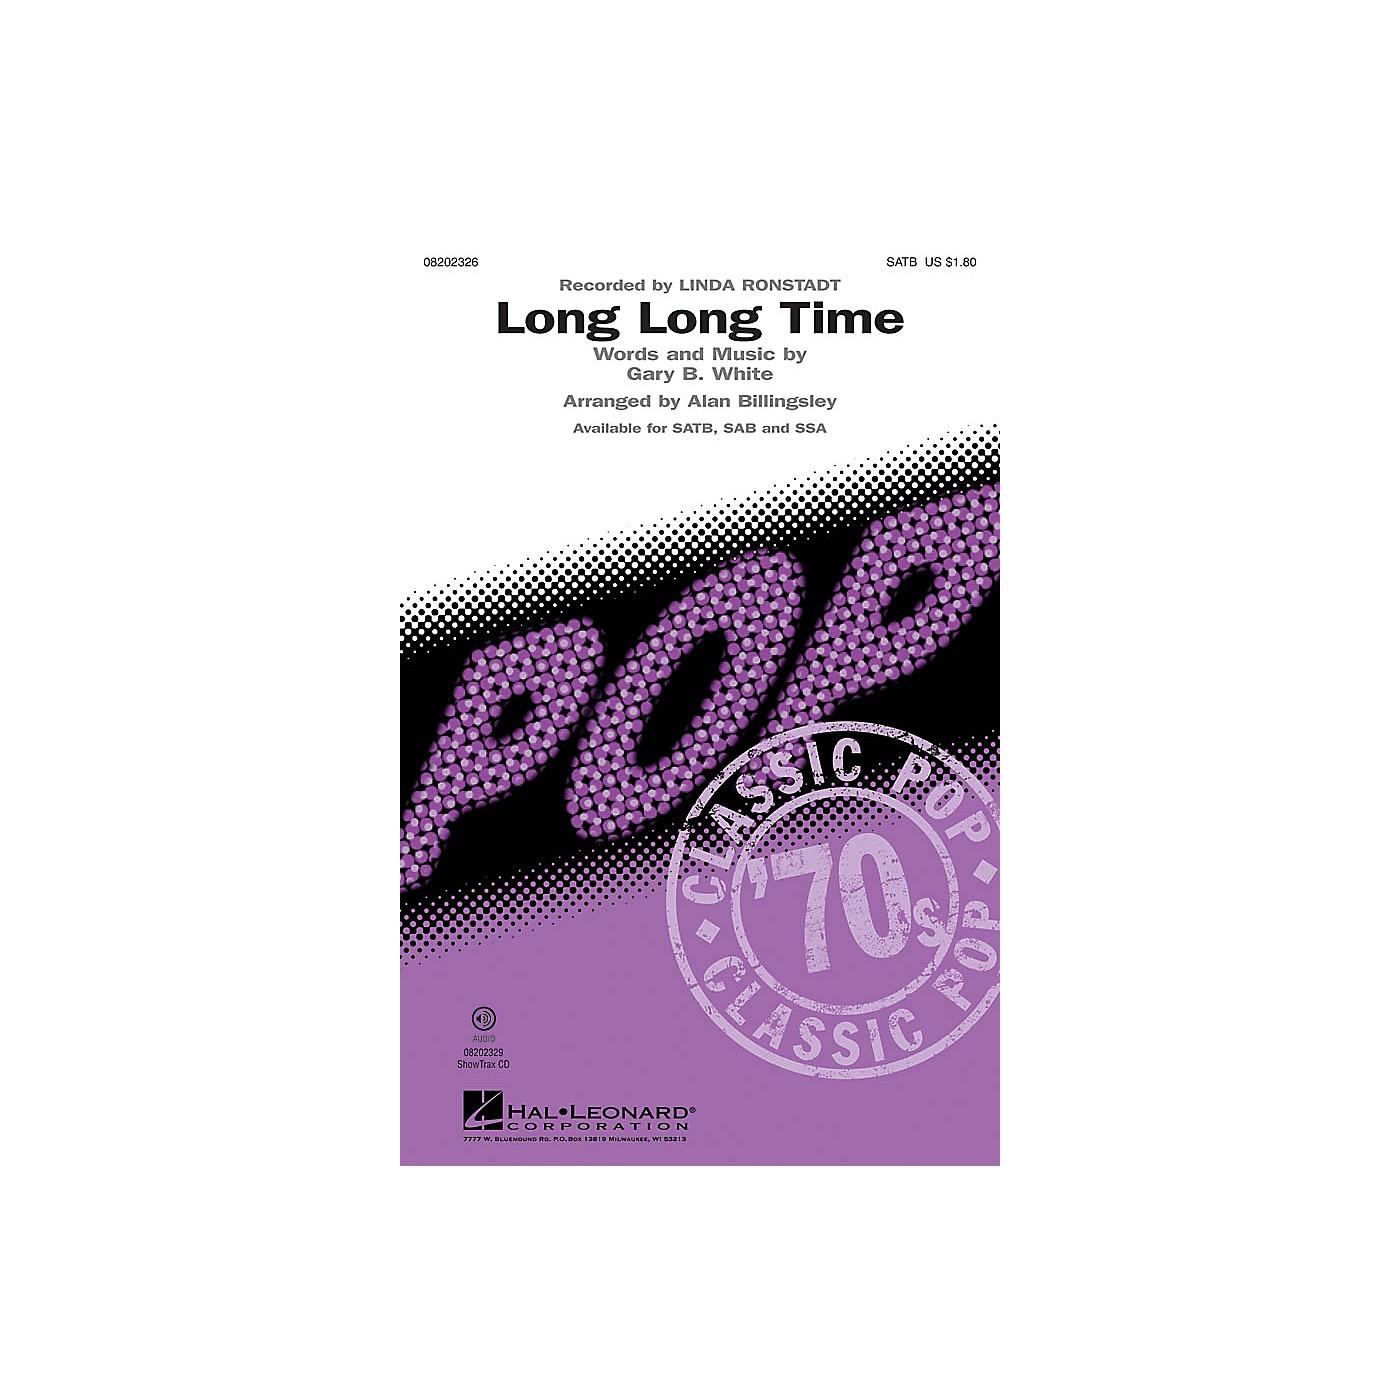 Hal Leonard Long Long Time ShowTrax CD by Linda Ronstadt Arranged by Alan Billingsley thumbnail